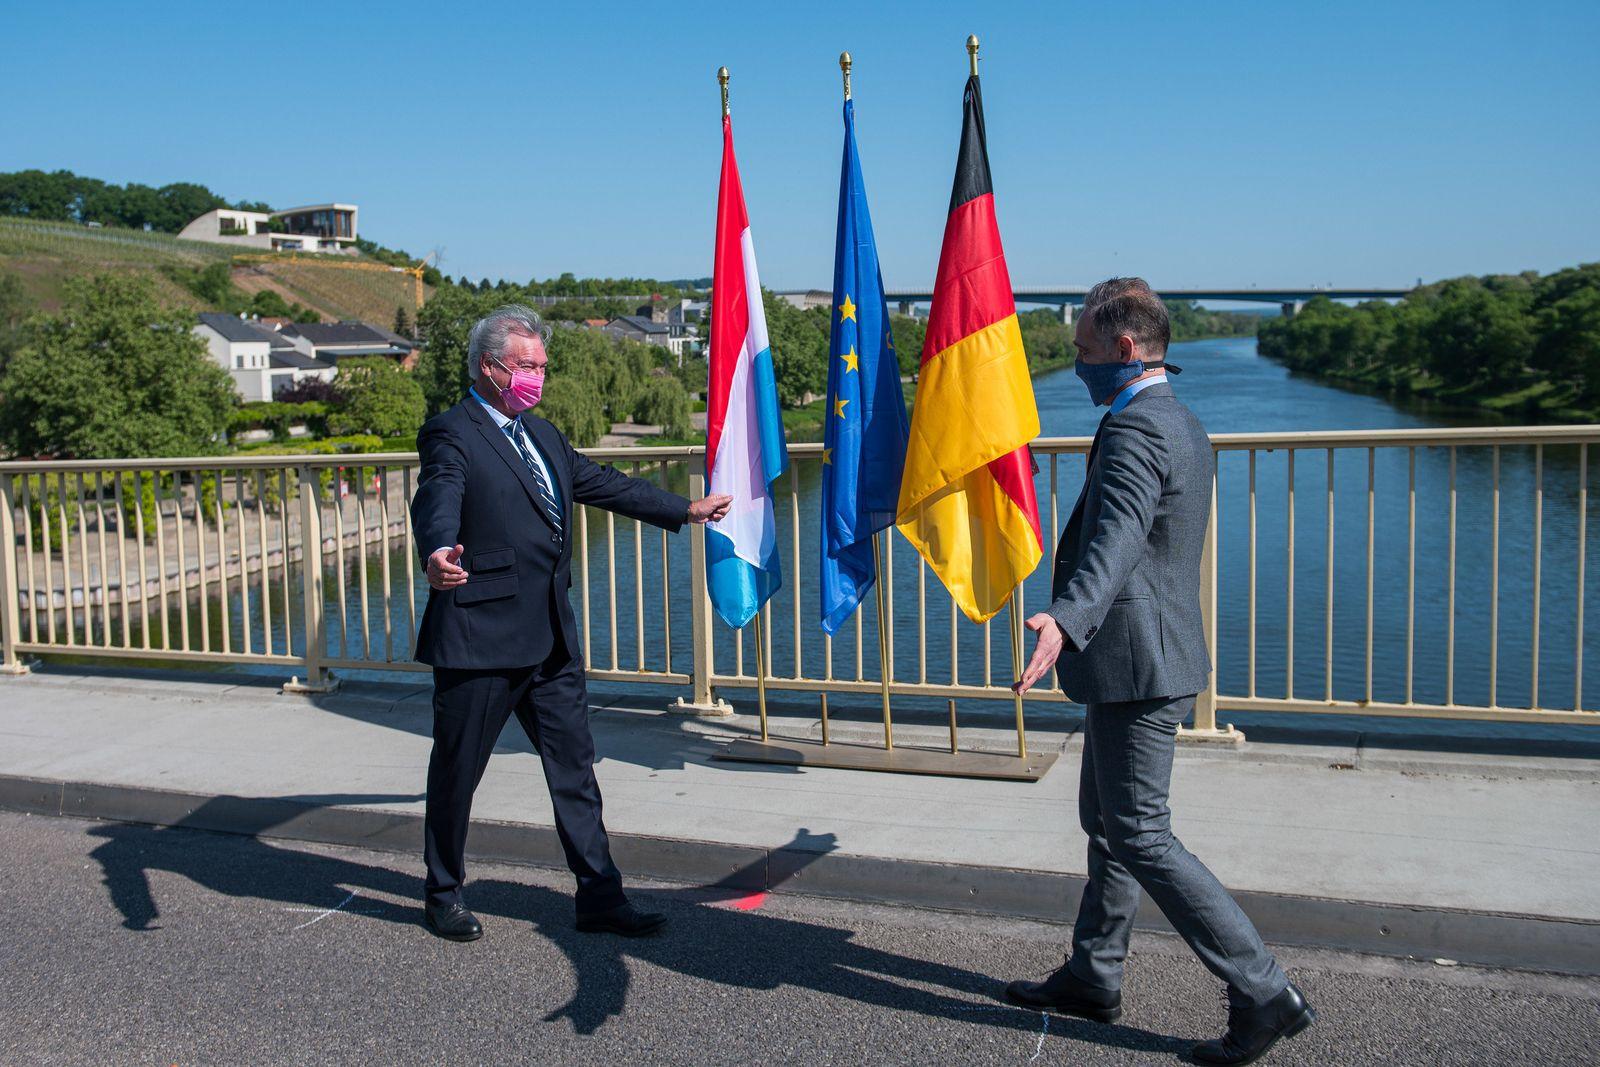 Heiko Maas / Jean Asselborn / Grenzöffnung